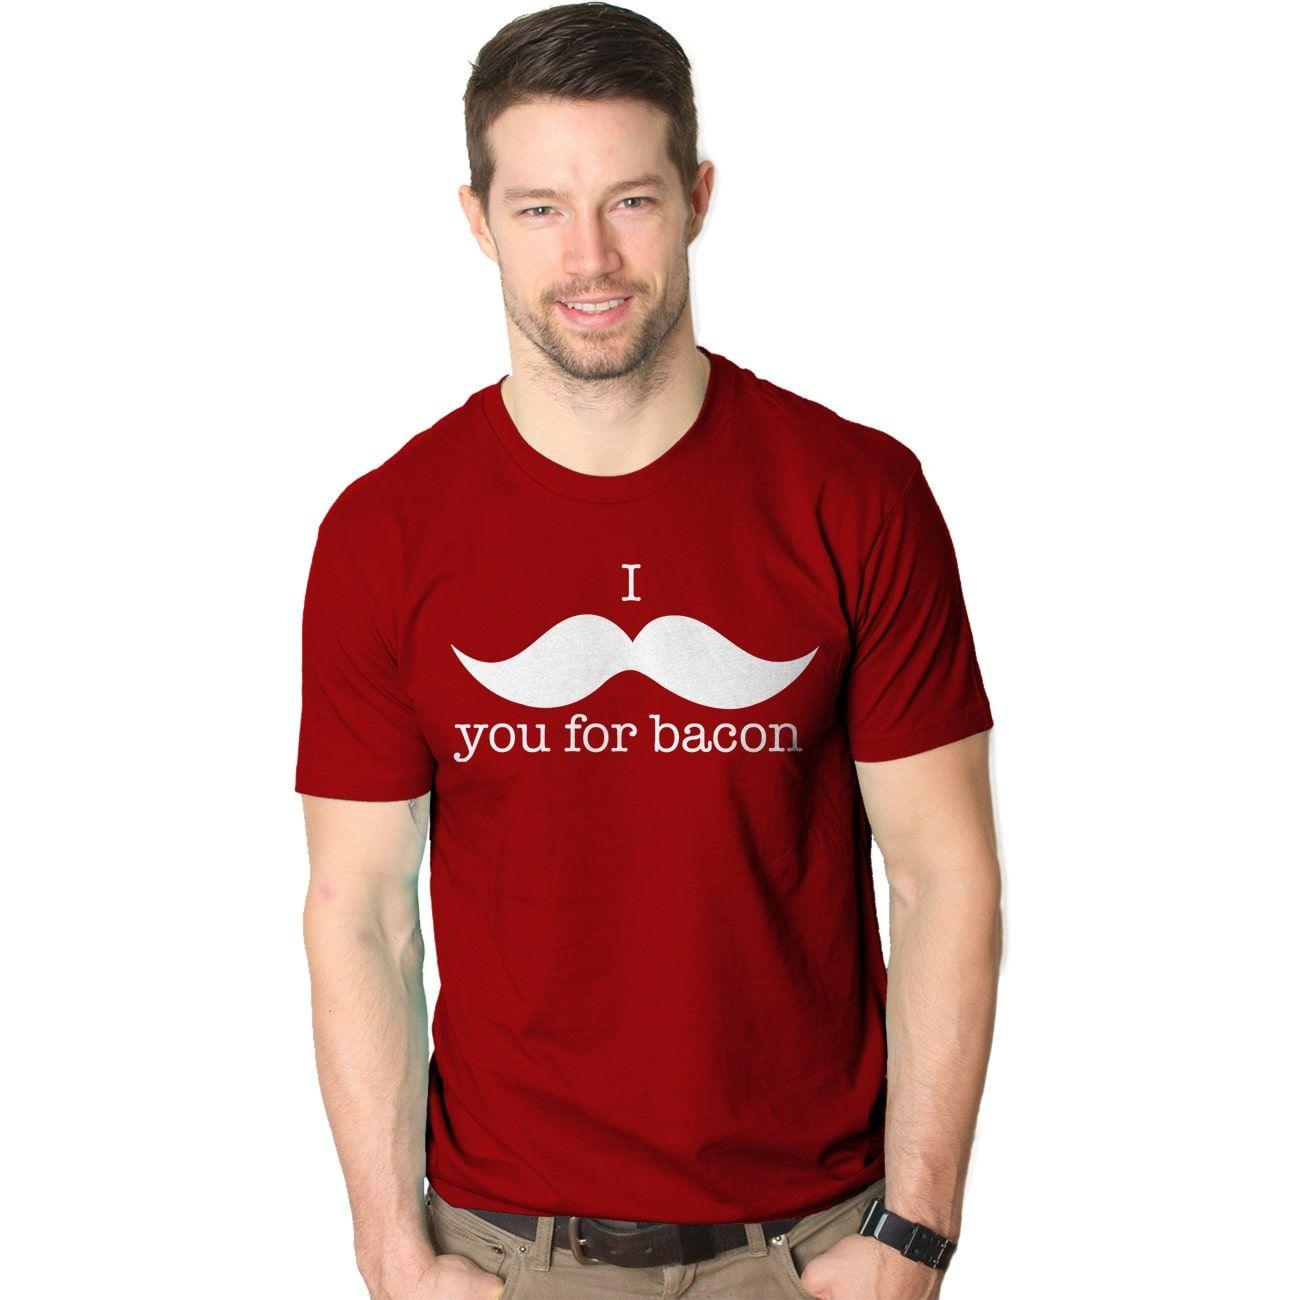 Leg day t shirts men s polo shirt slim - I Mustache You For Bacon T Shirt Funny Bacon Shirt Mustache Tee By Crazy Dog T Shirts Men S